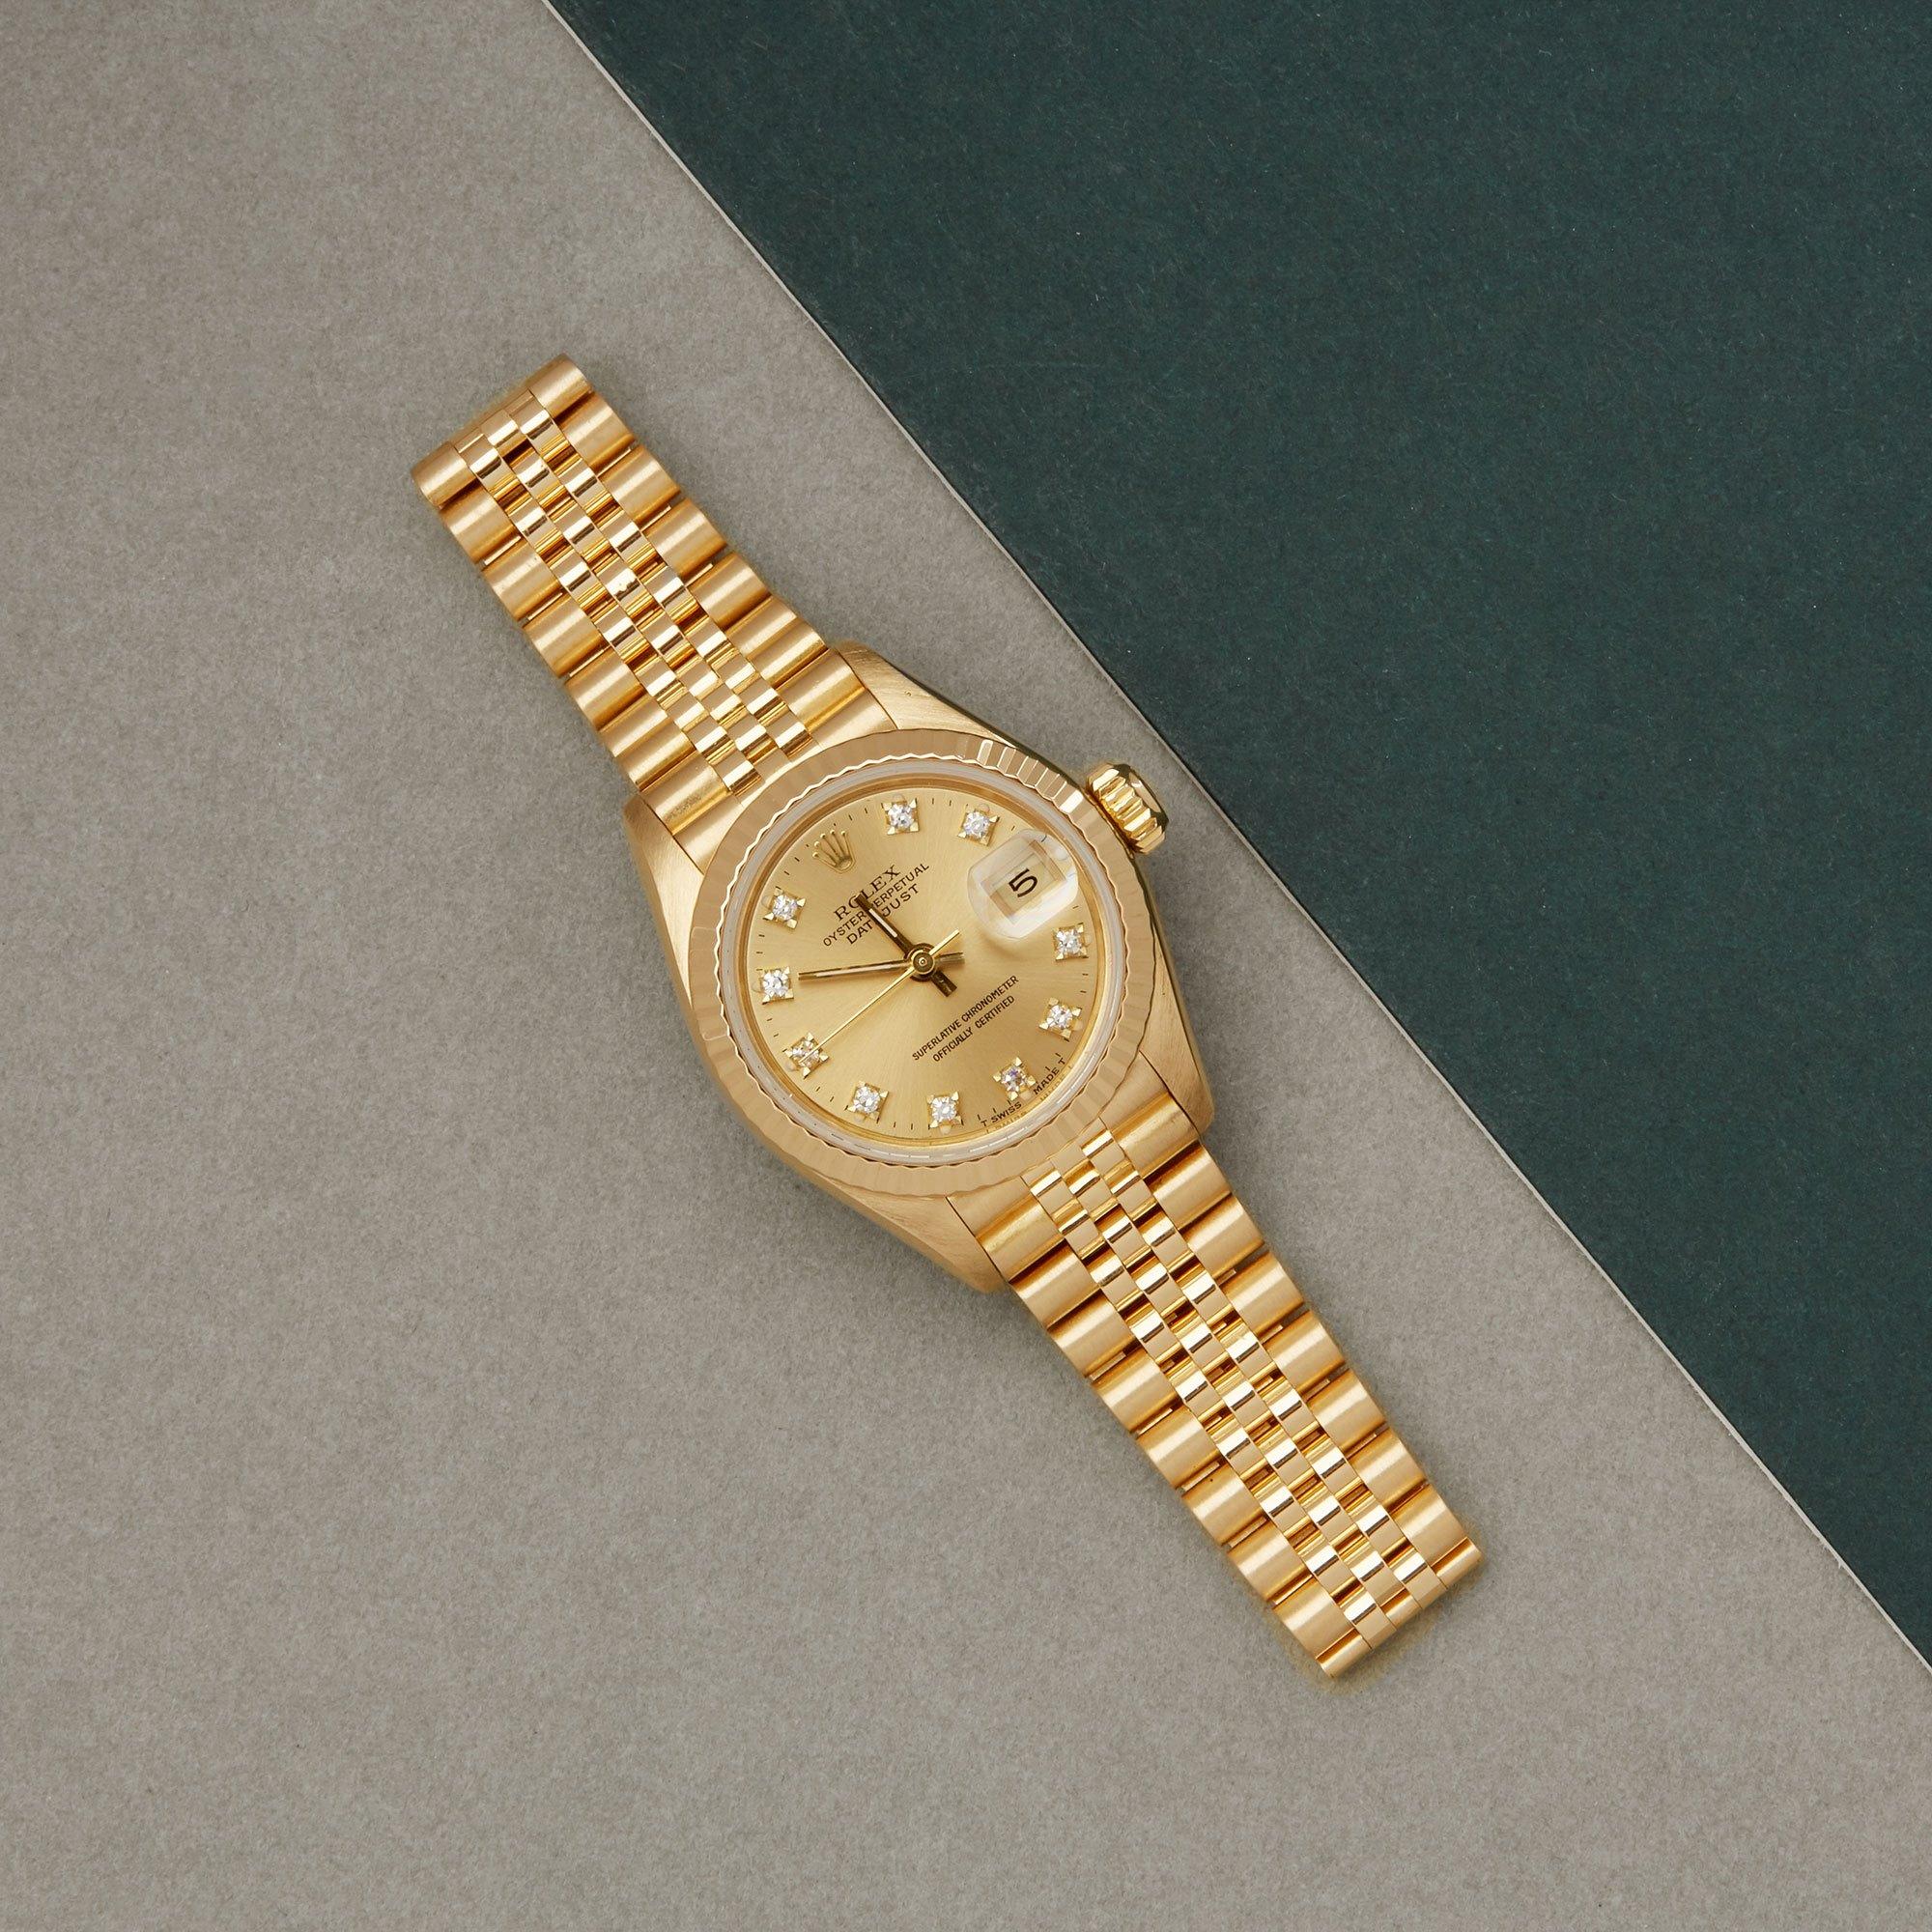 Rolex Datejust 26 Diamond 18K Yellow Gold 69178G